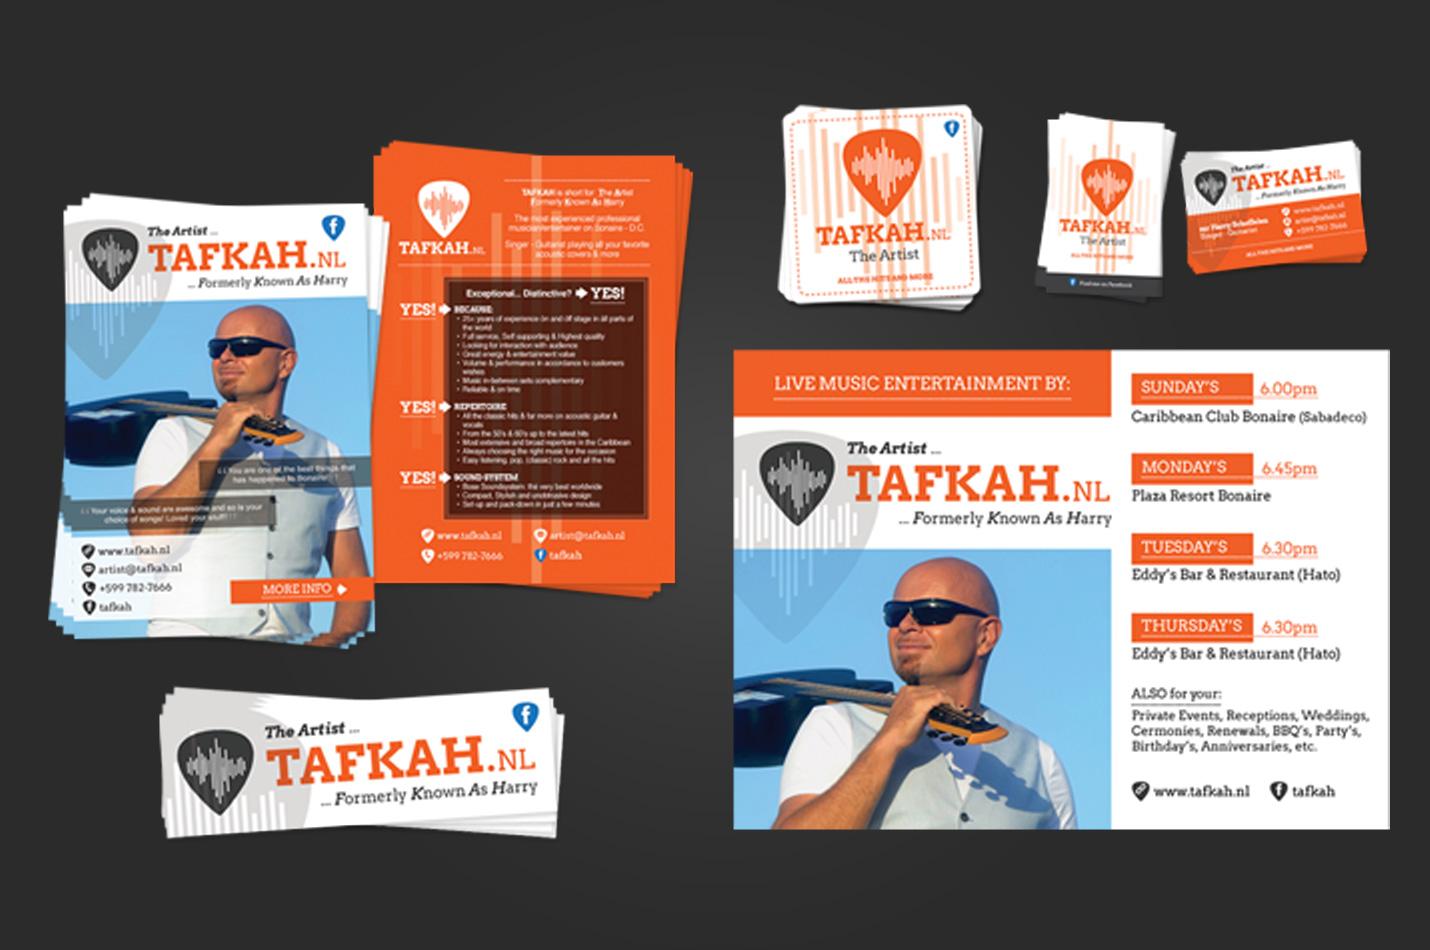 Tafkah.nl - graphic design by k-Dushi.com